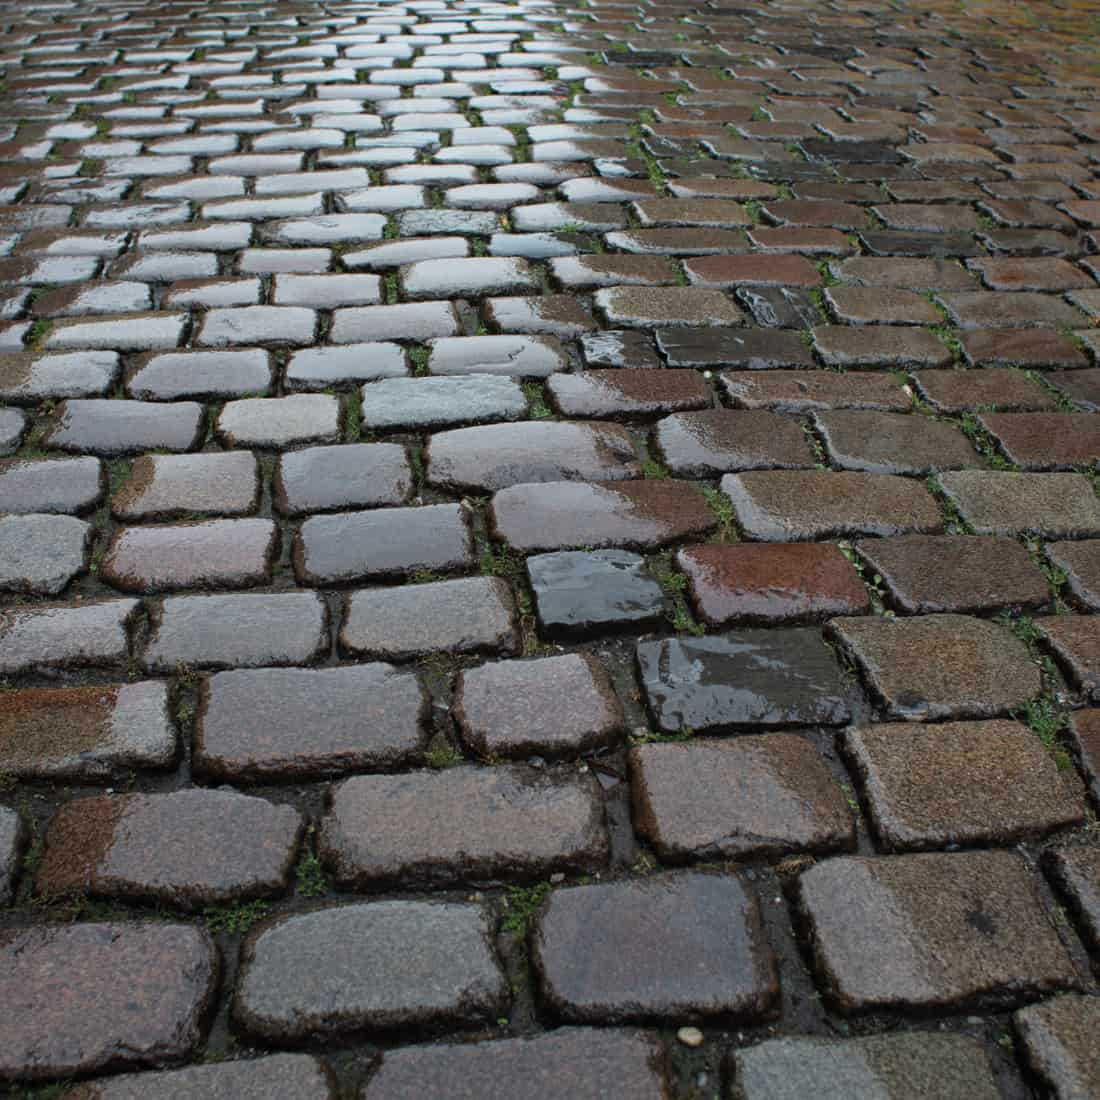 Wet cobblestone pavement